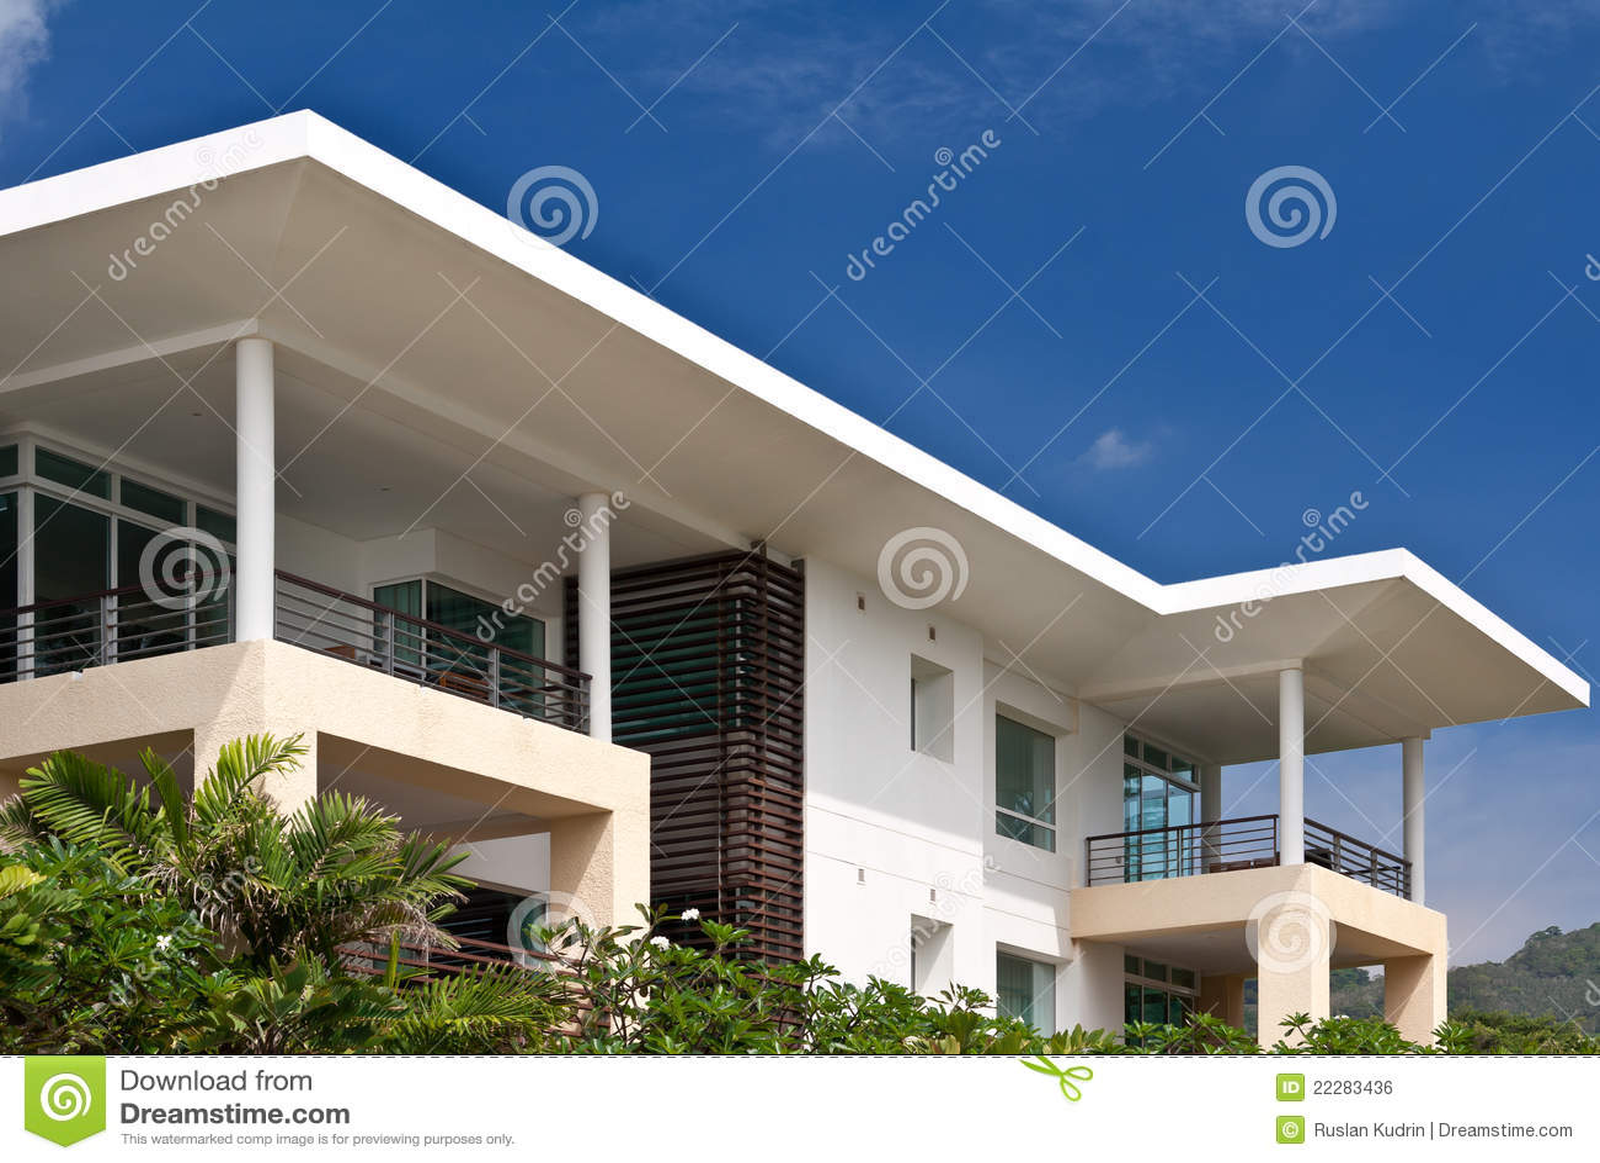 Modern house on a background of blue sky